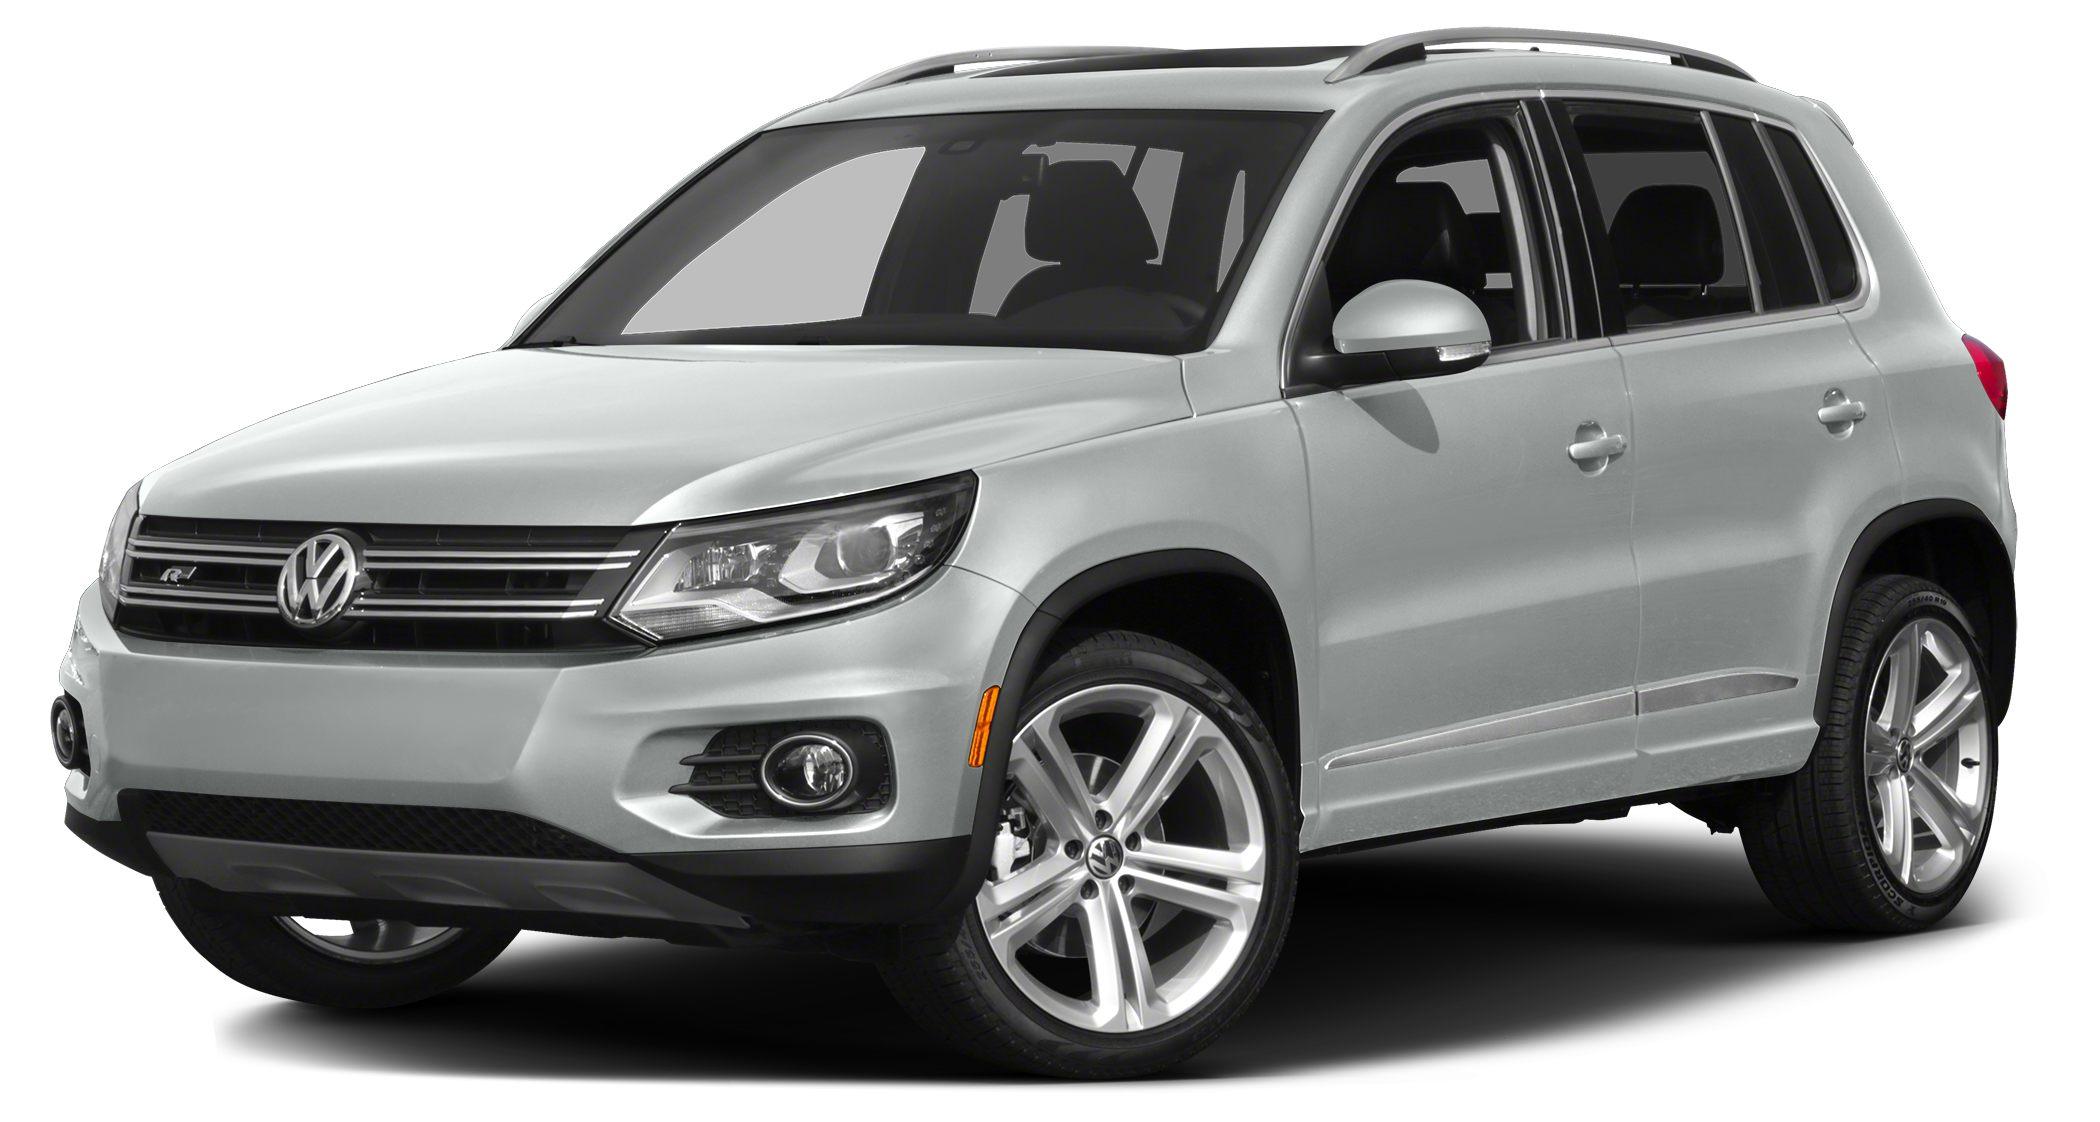 2016 Volkswagen Tiguan R-Line Miles 3Color Pure White Stock V3276 VIN WVGAV7AX6GW503447